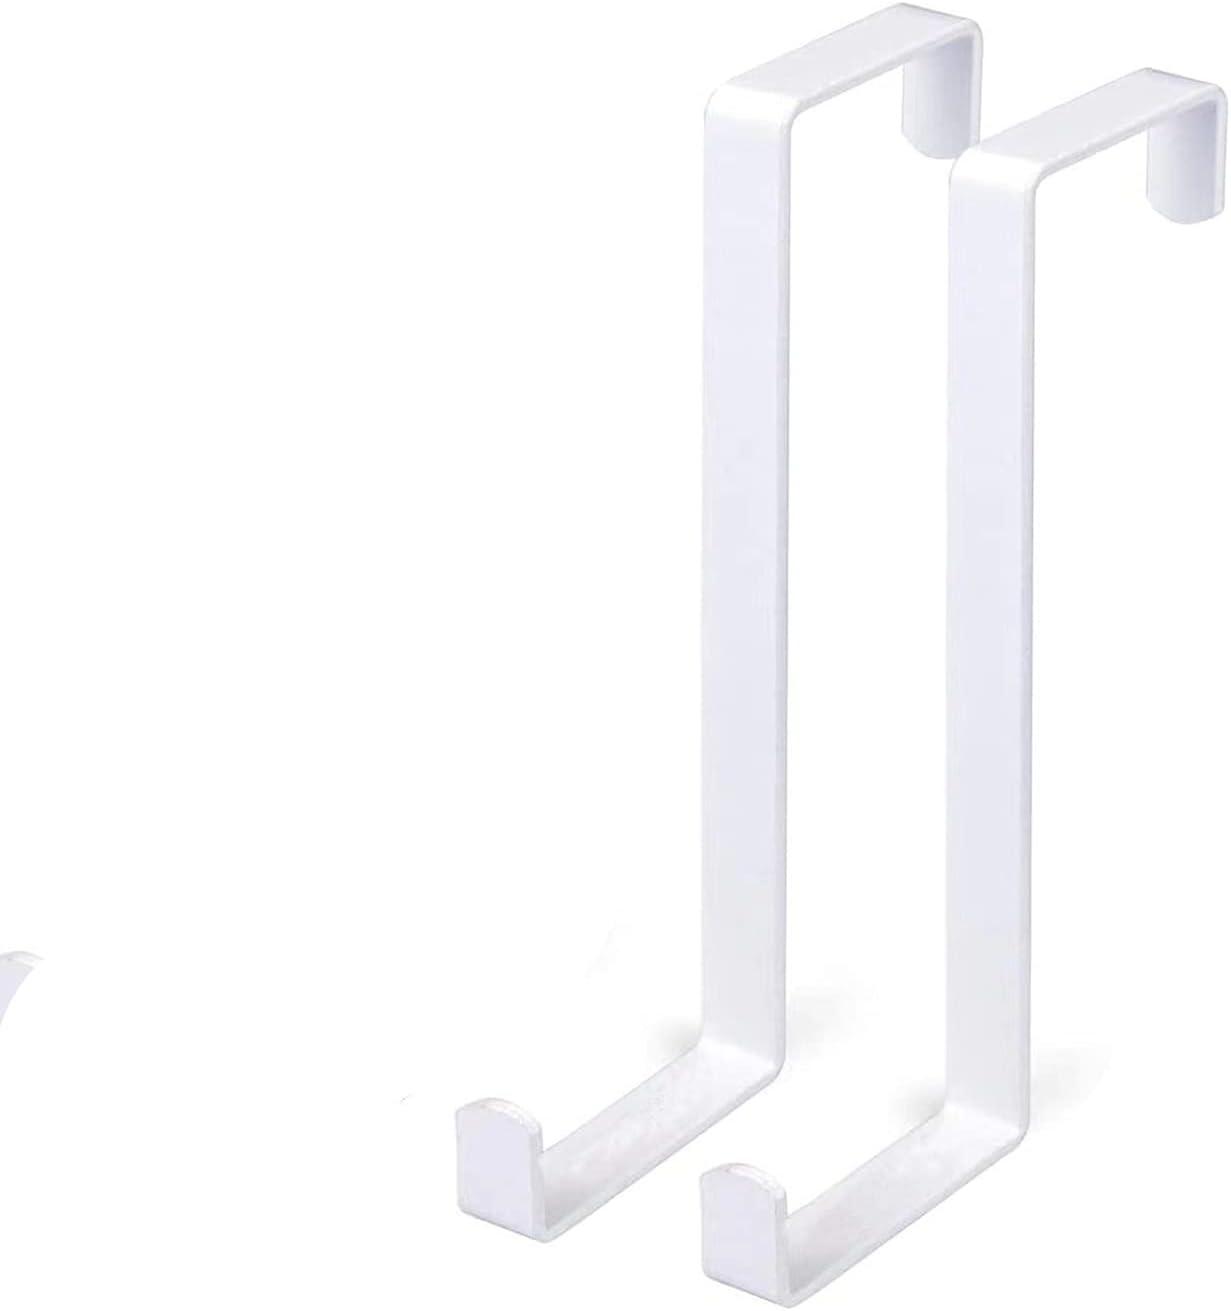 HEIGOO Nippon regular agency 2 Pcs Over The Door Inch Sturdy Reversible Hook,3.5 Max 74% OFF